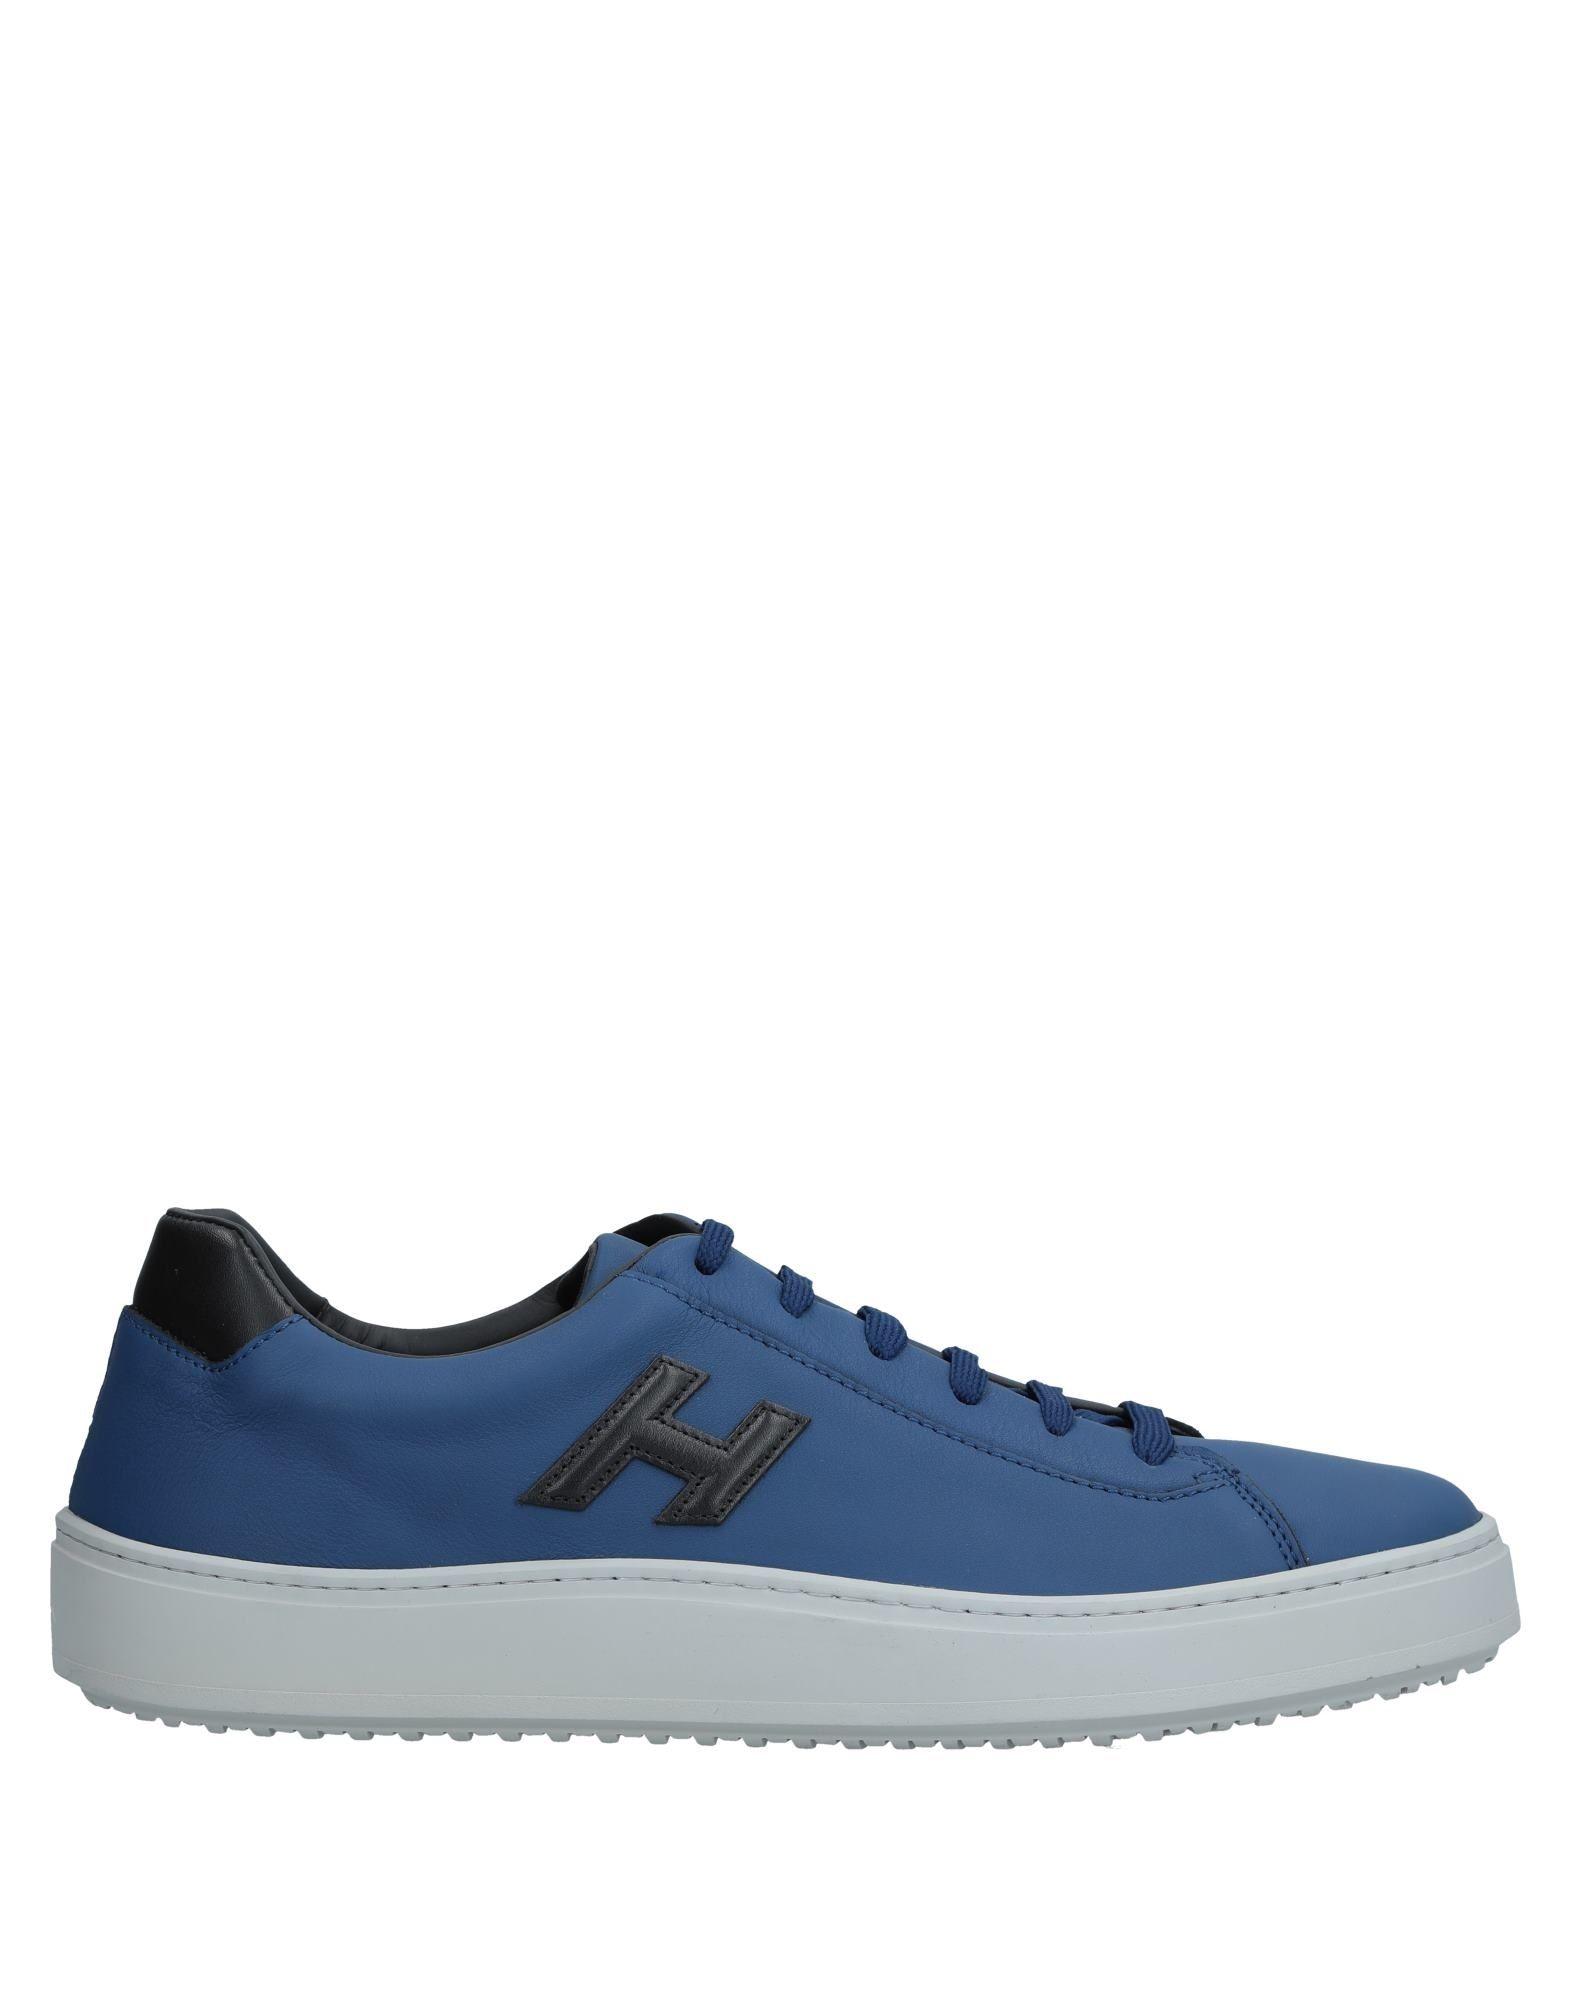 Hogan Sneakers Herren  11544708FM Gute Qualität beliebte Schuhe